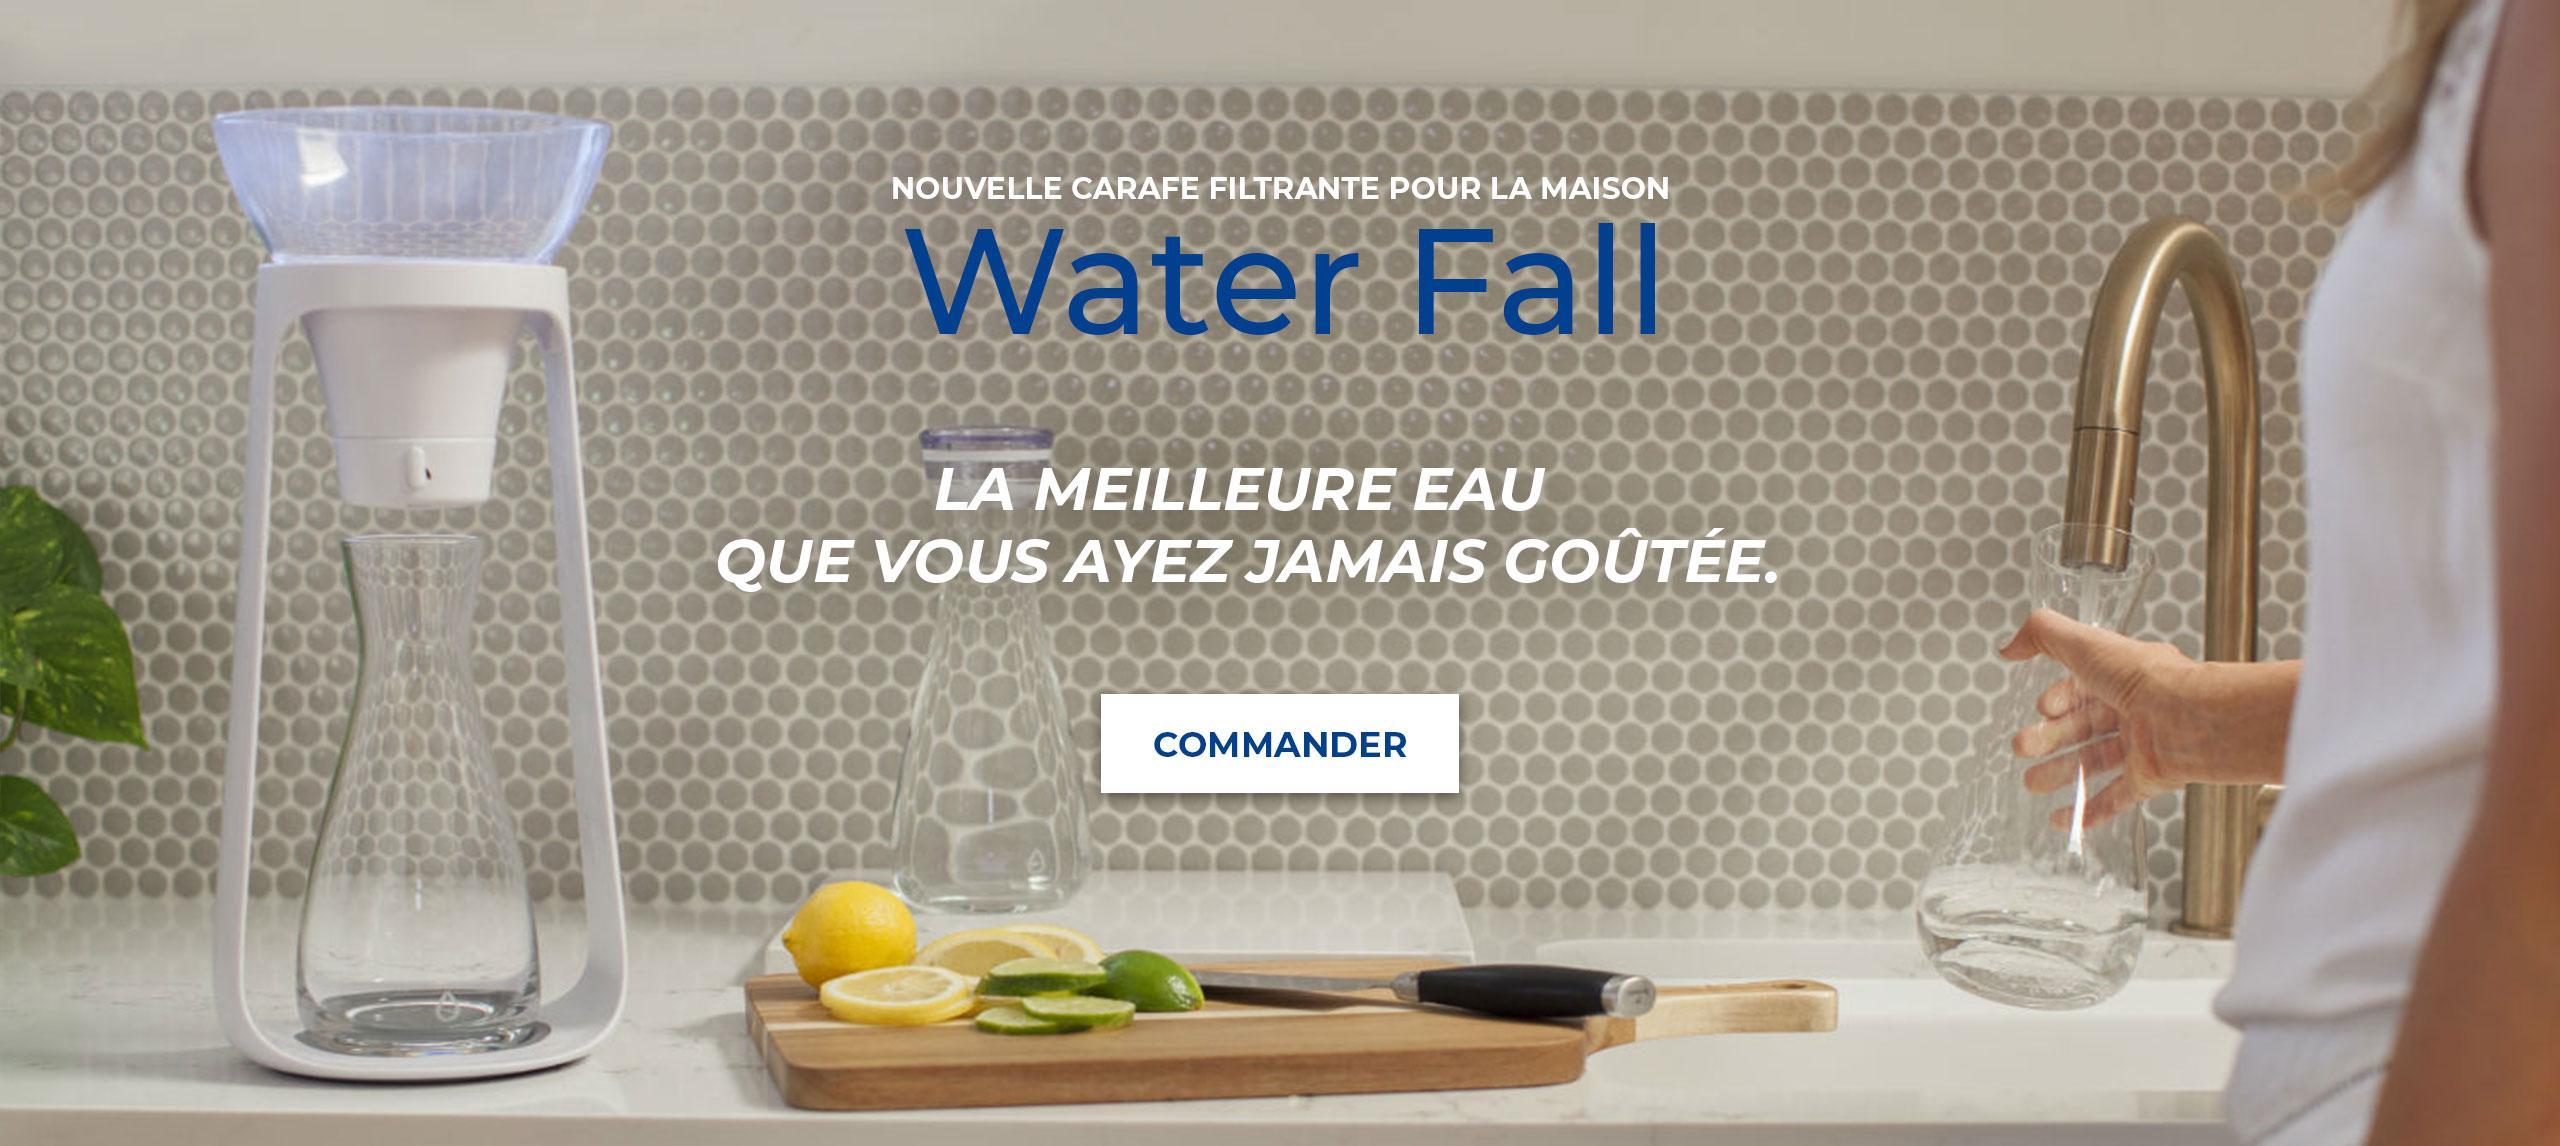 Carafe d'eau filtrante KOR Water Fall